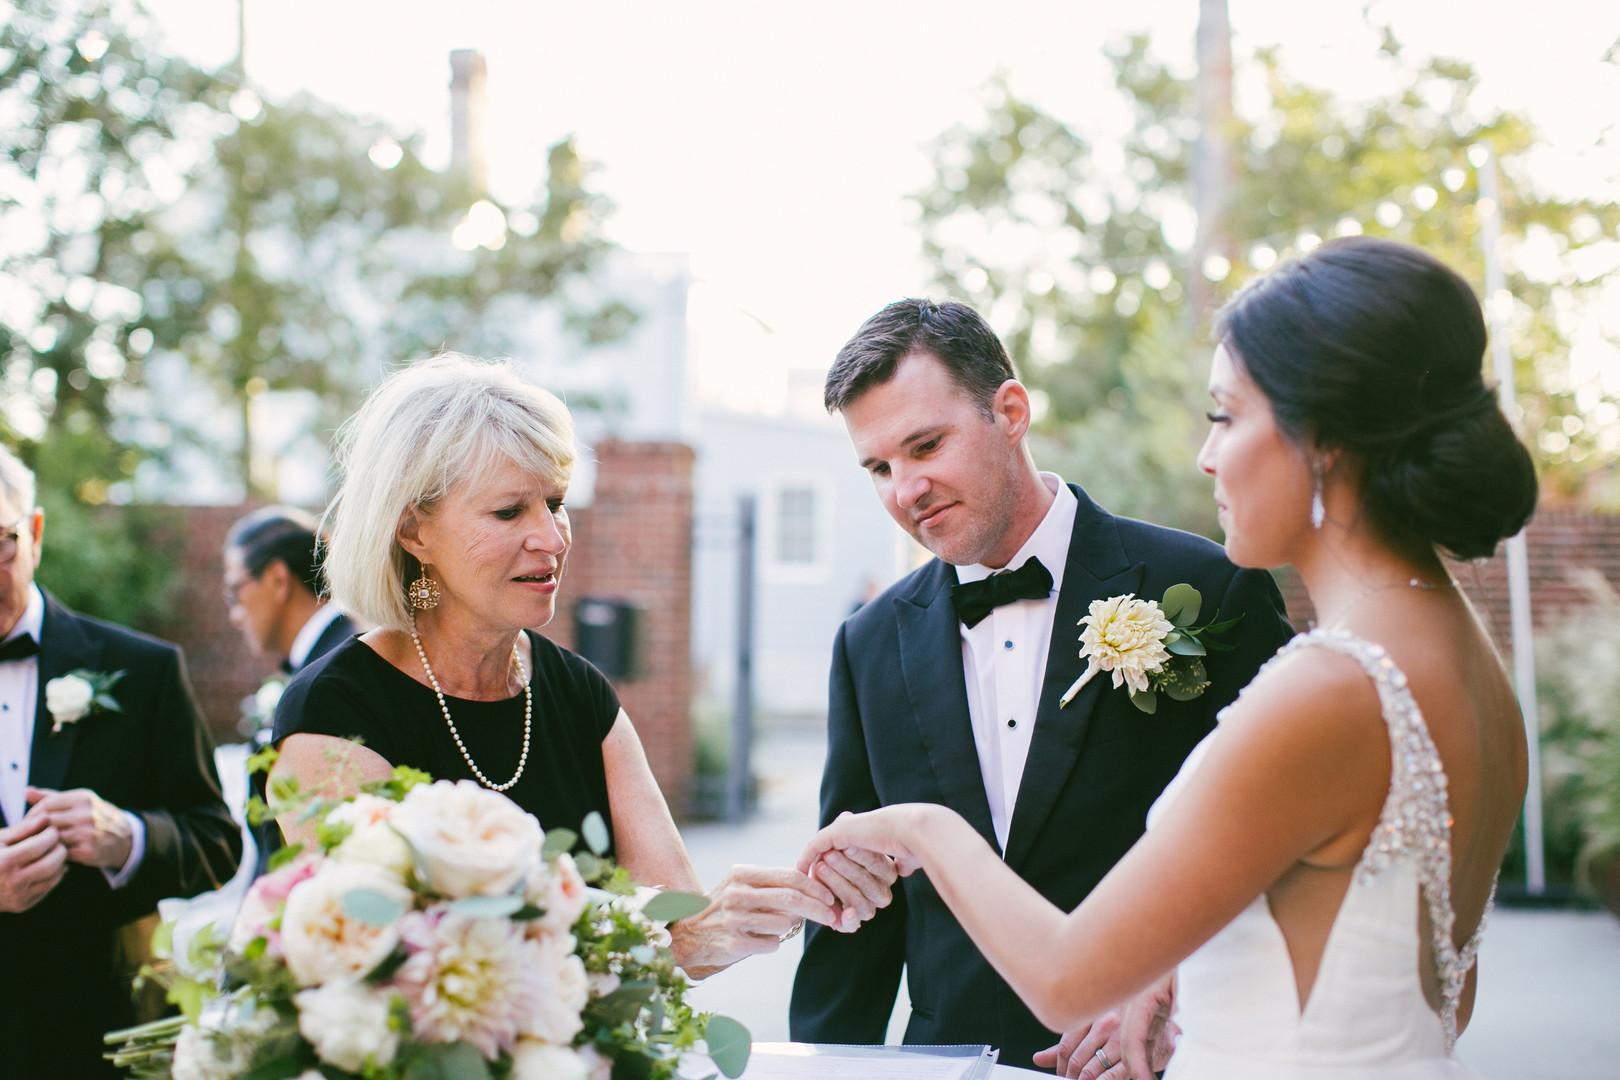 cedar-room-wedding-18.jpg